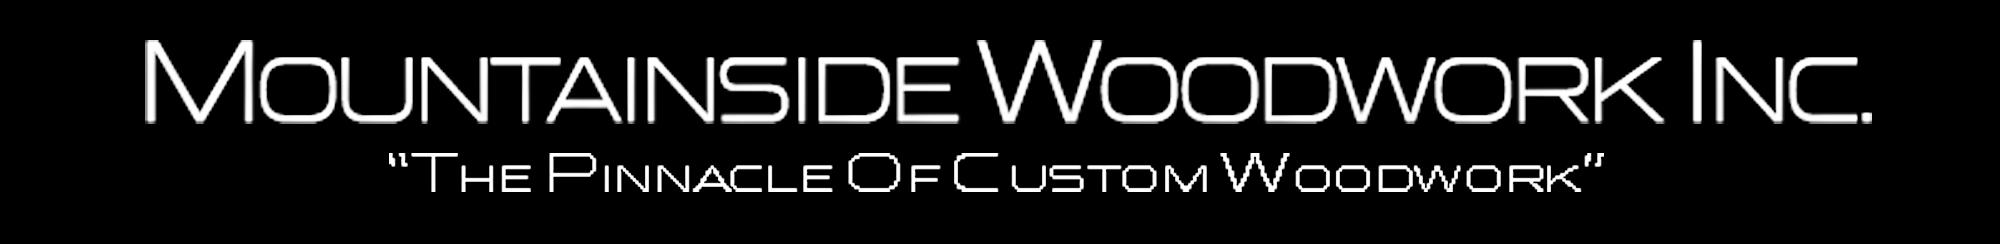 Mountainside Woodwork Inc.